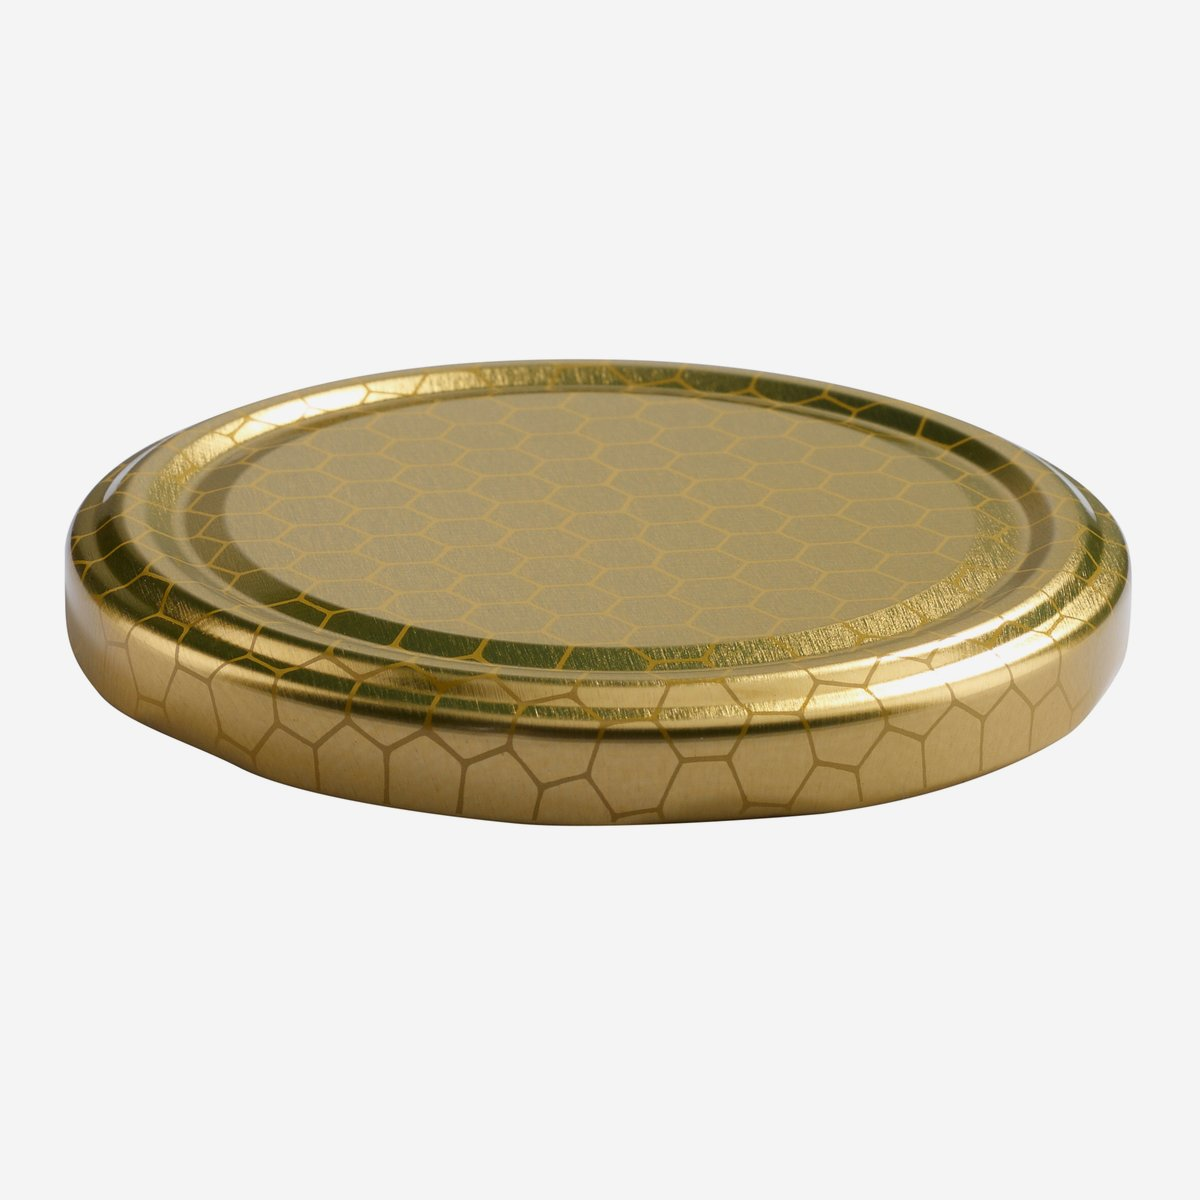 twist off deckel 82mm gold mit wabendekor karton online bestellen. Black Bedroom Furniture Sets. Home Design Ideas